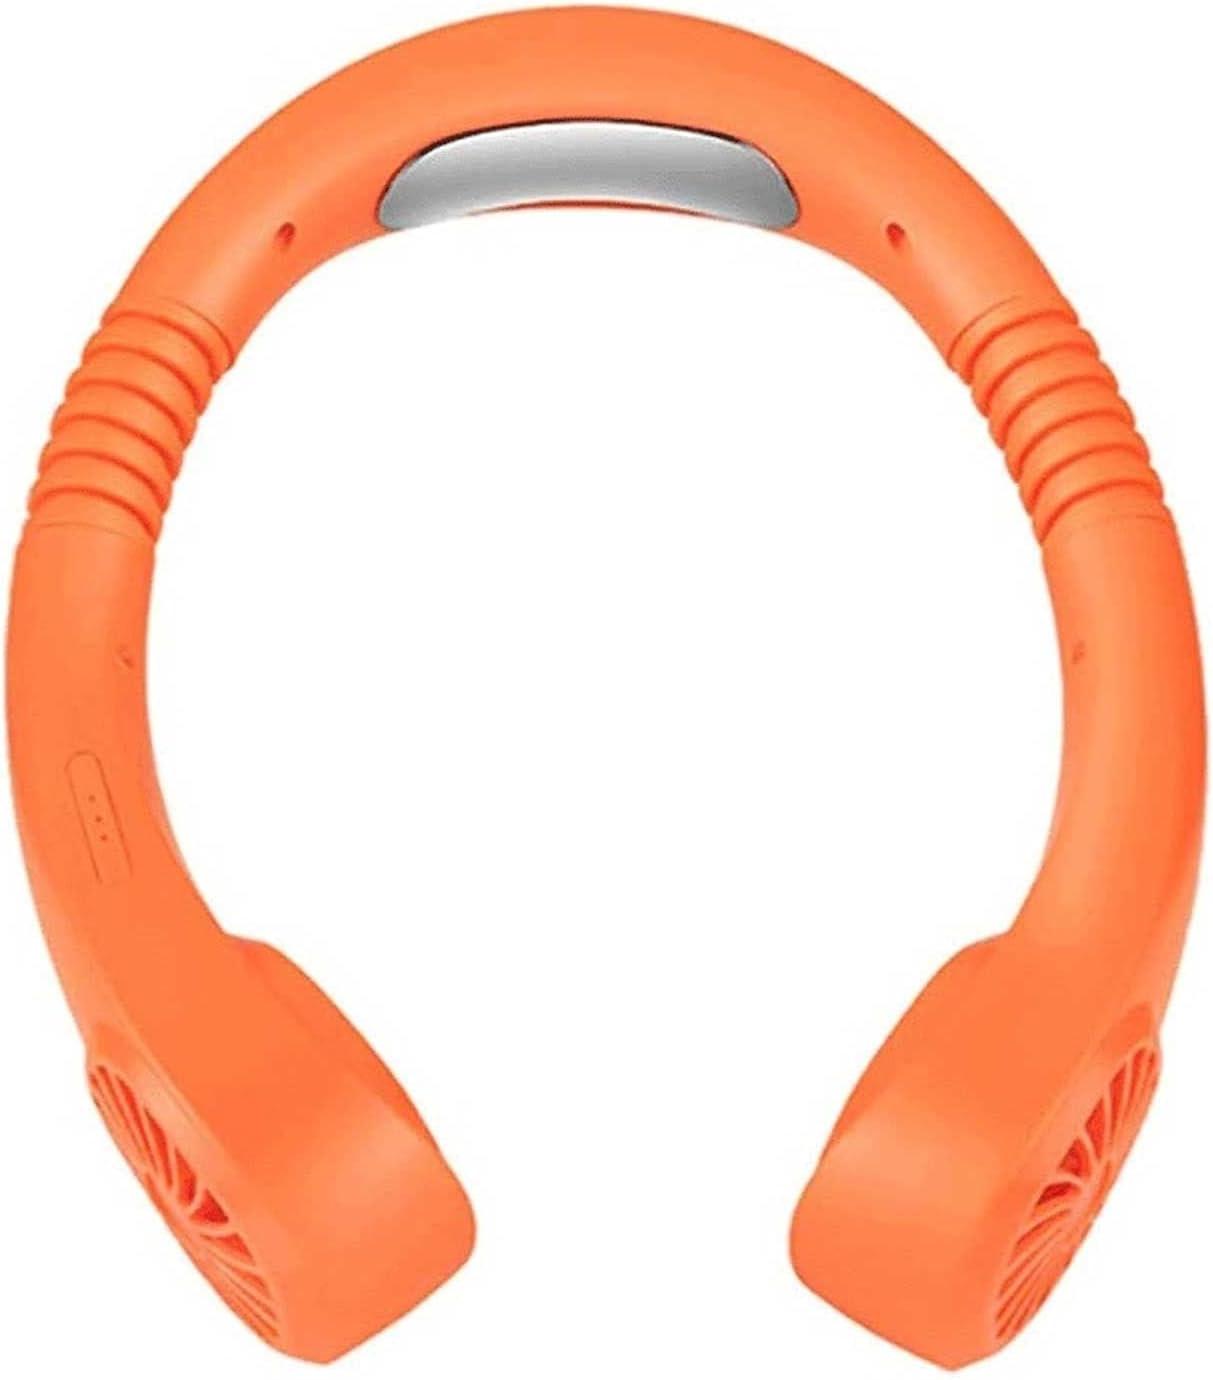 UOOD Neck Fan Max 68% OFF 3200mah Battery Operated Neckband Wearabl Elegant Free